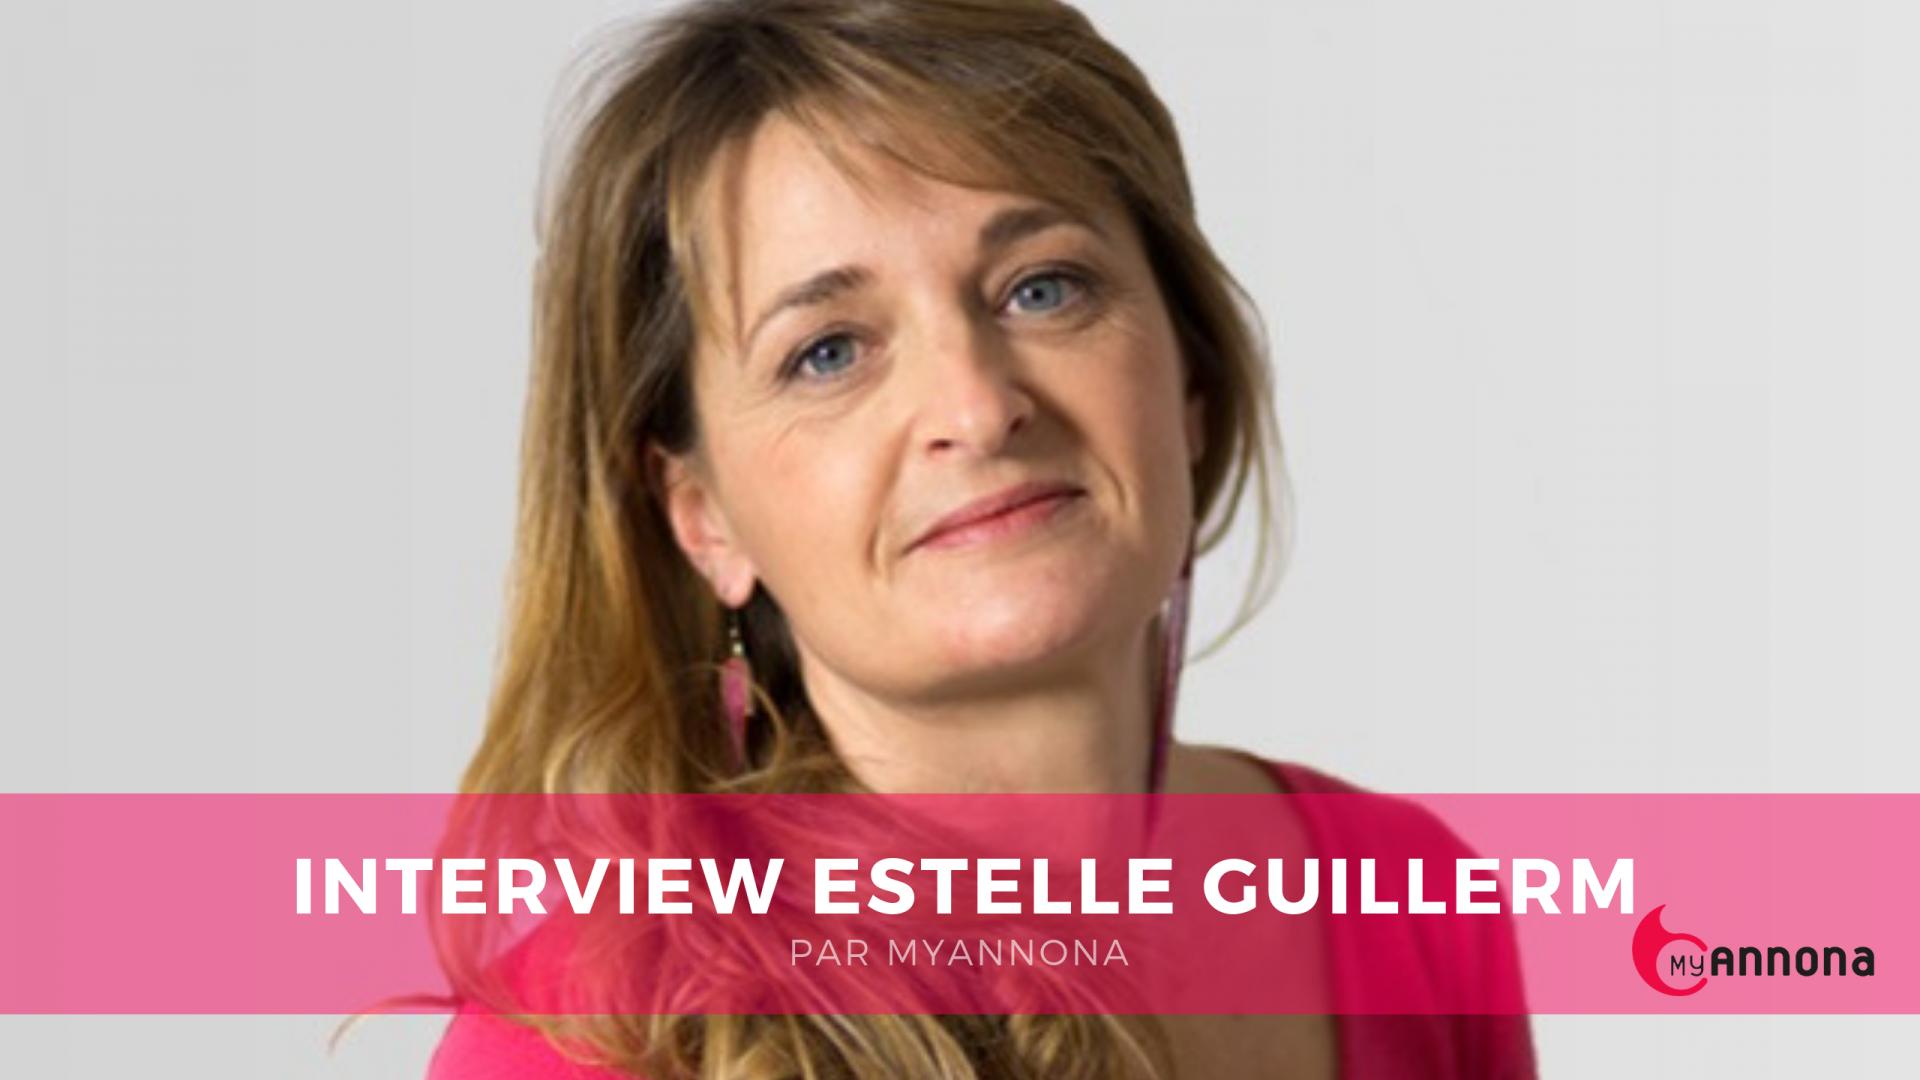 Interview estelle guillerm